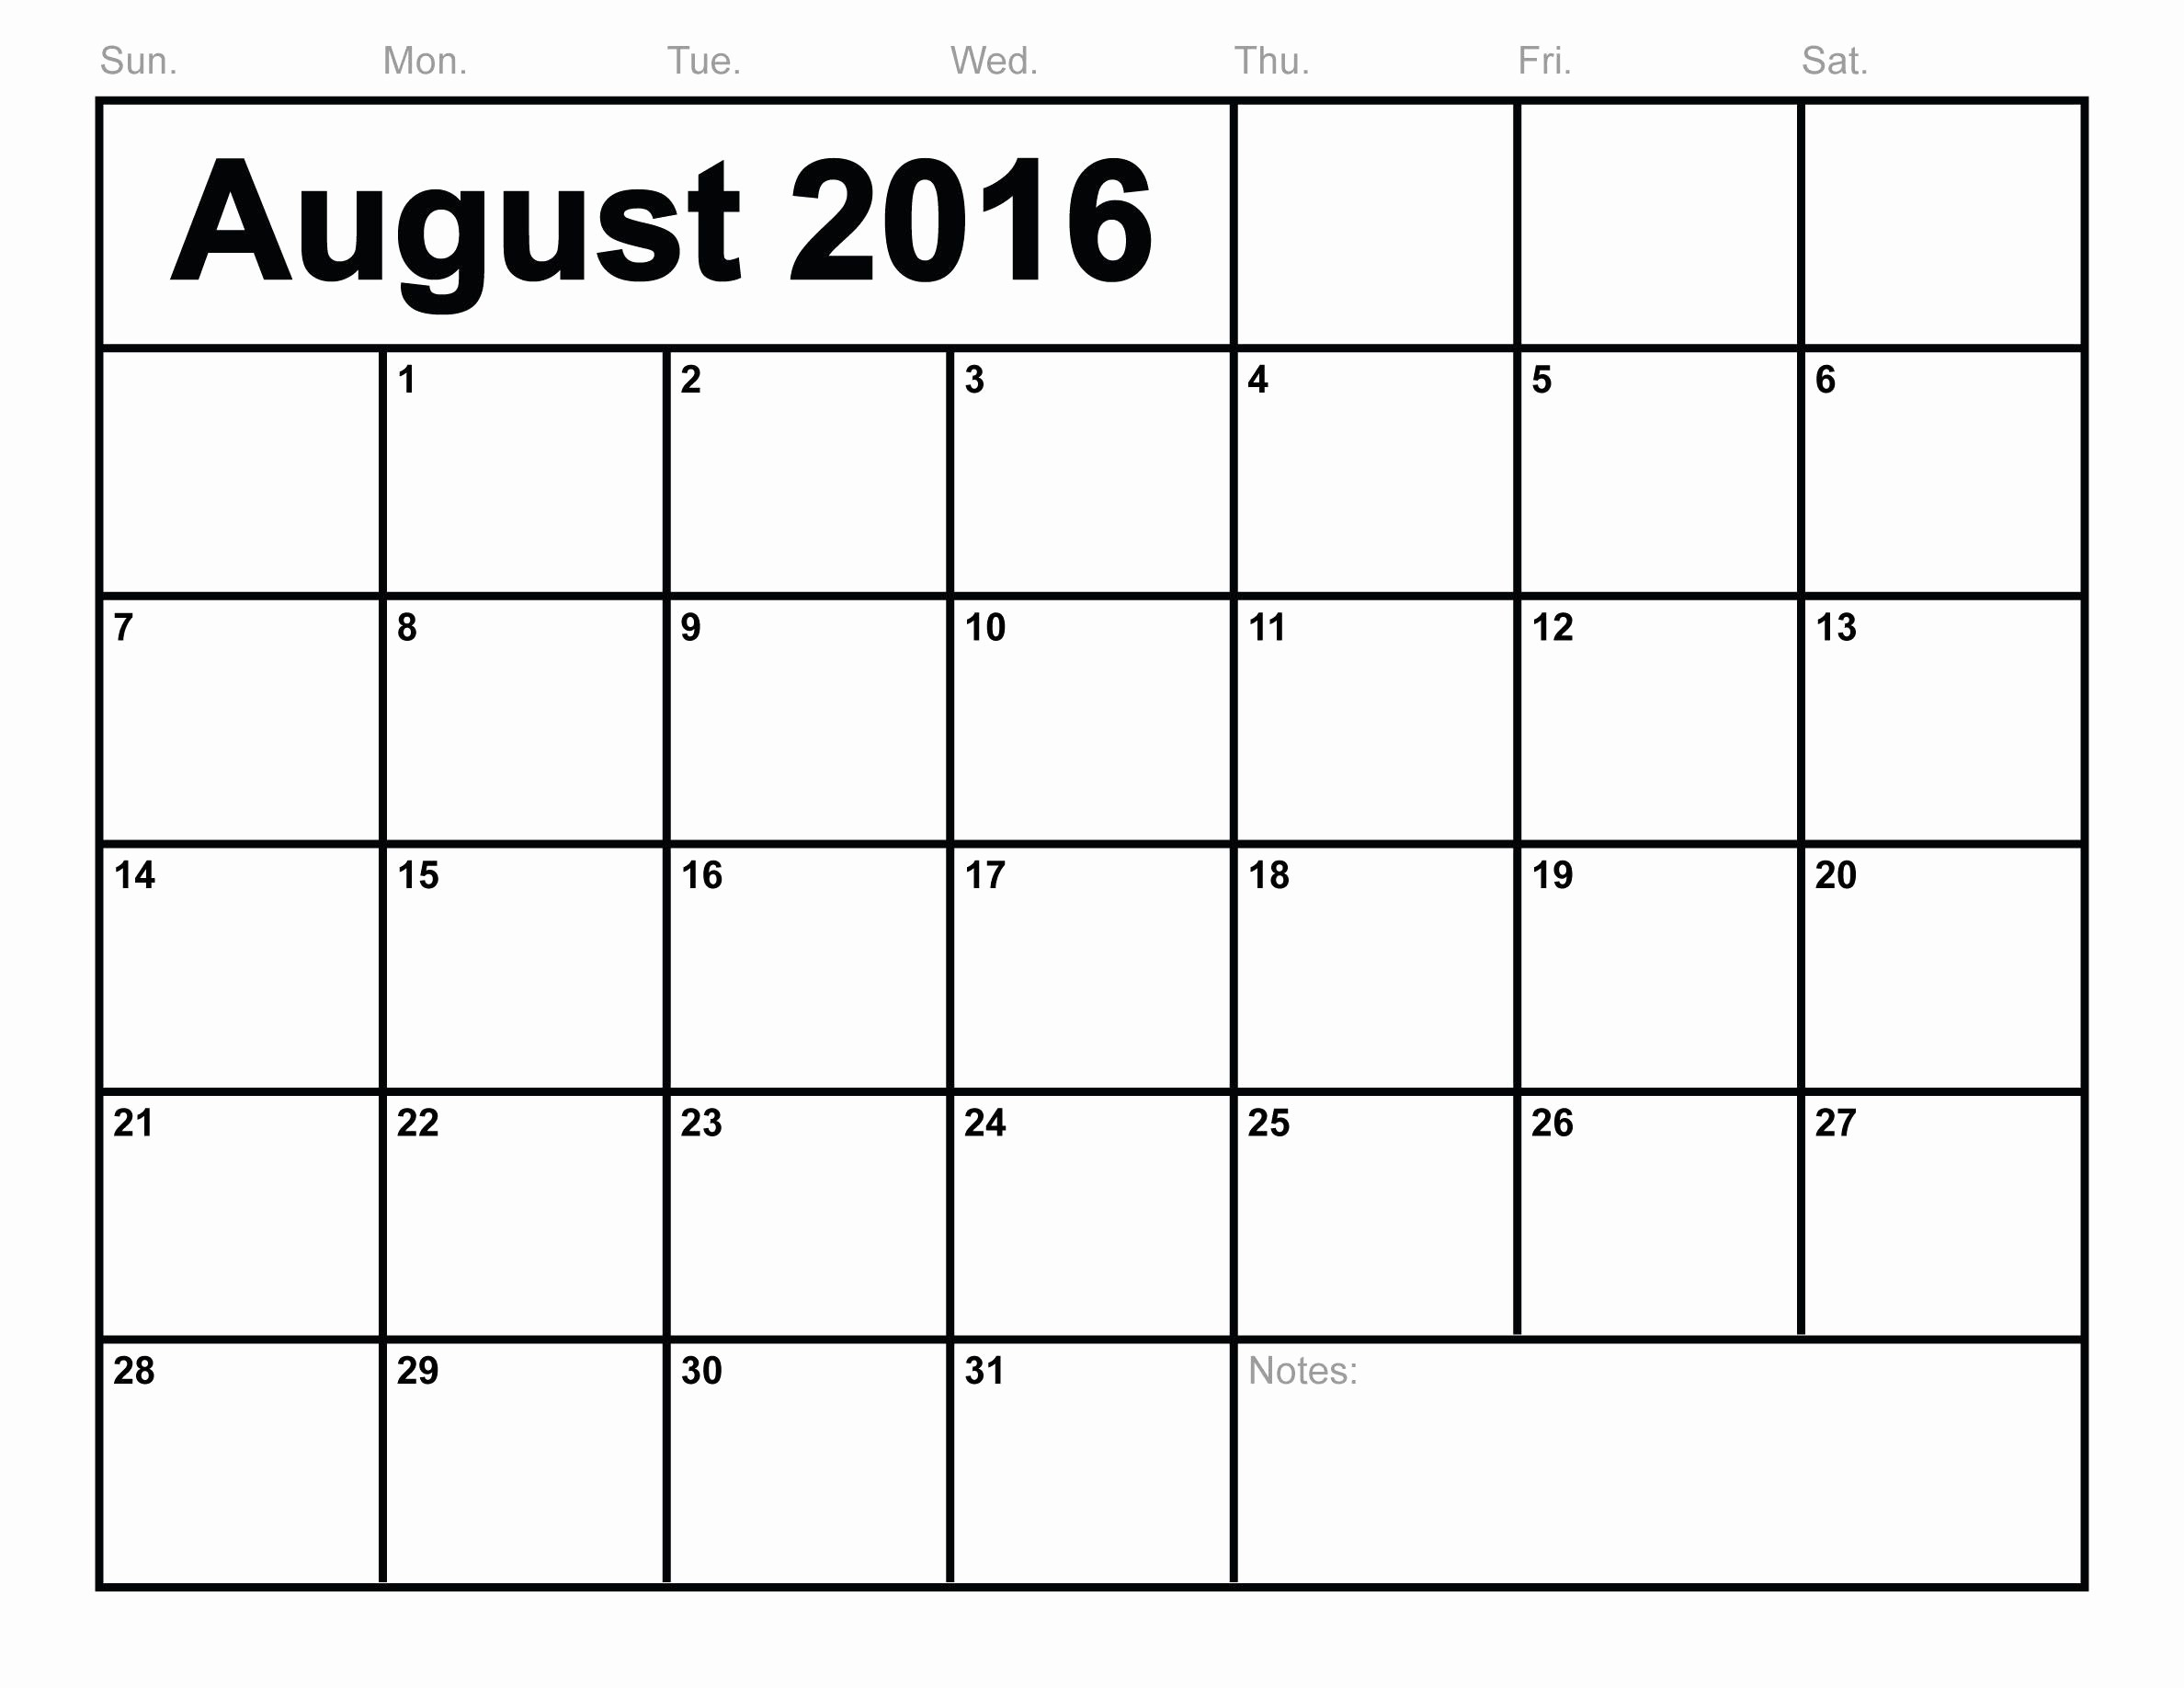 Free Printable Calendars 2016 Templates Elegant You Can August 2016 Calendar Template Printable